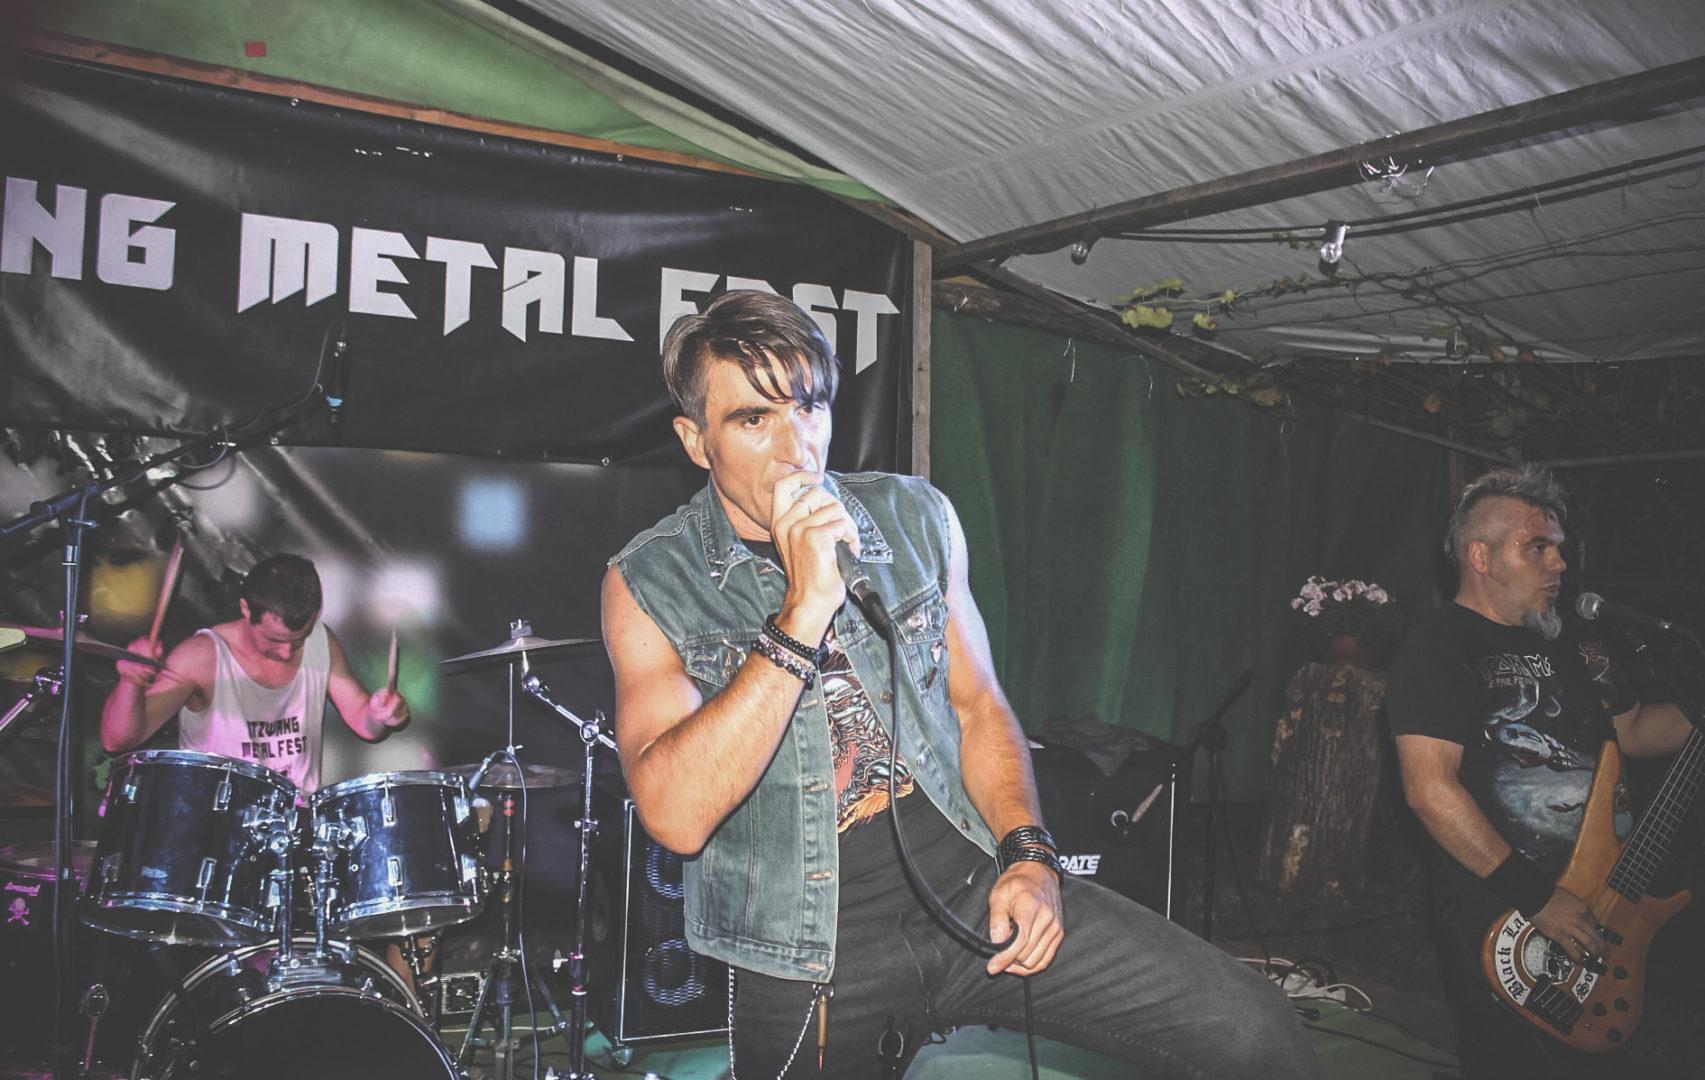 Anguish Force Atzwang Metal Fest 2019 15 - Atzwang Metal Fest 9 - live